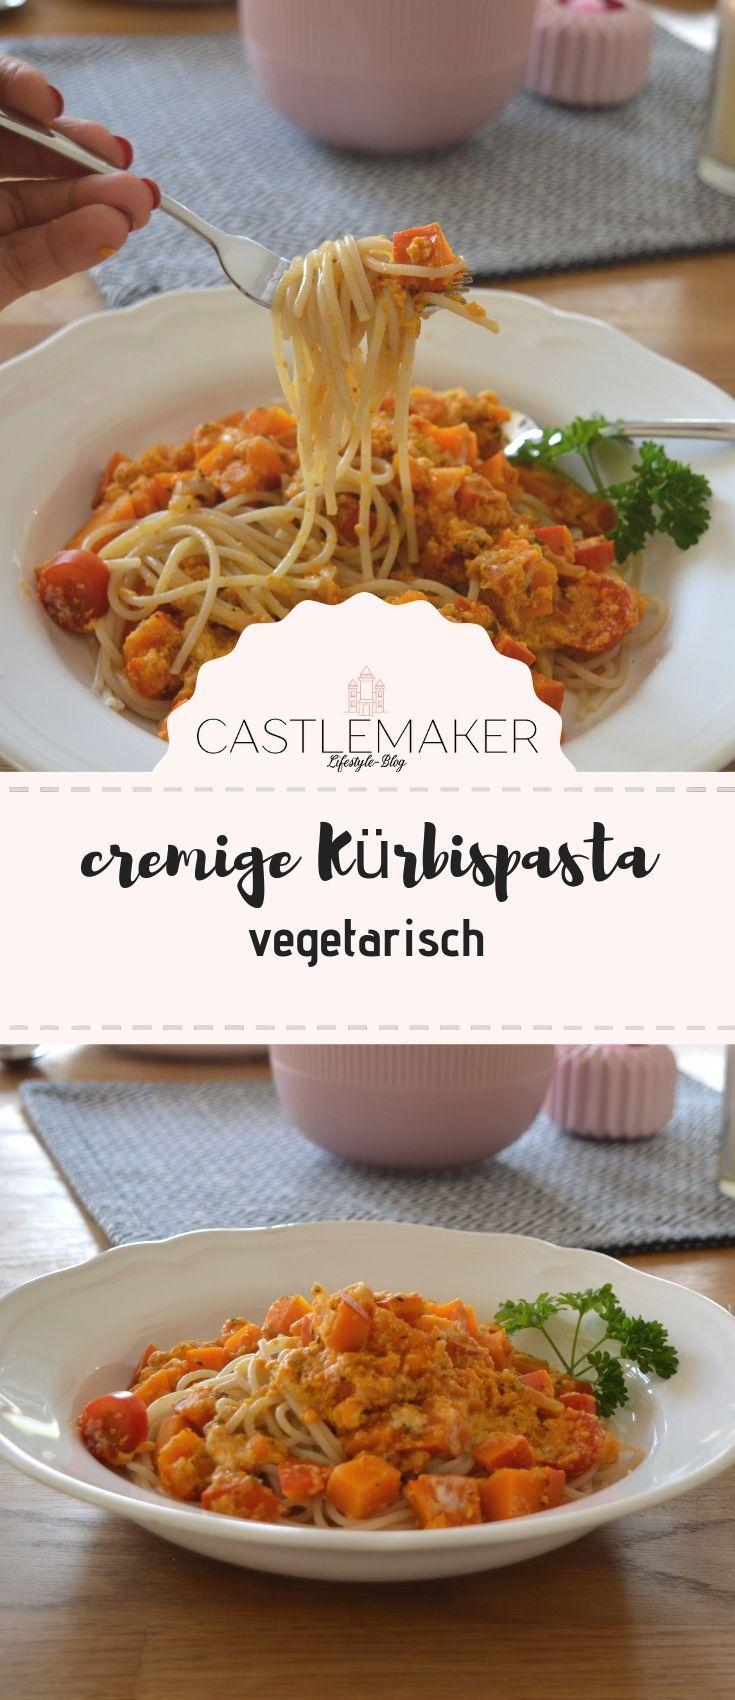 Photo of Spaghetti with vegetarian pumpkin bolognese – creamy pumpkin pasta «CASTLEMAKER Lifestyle Blog